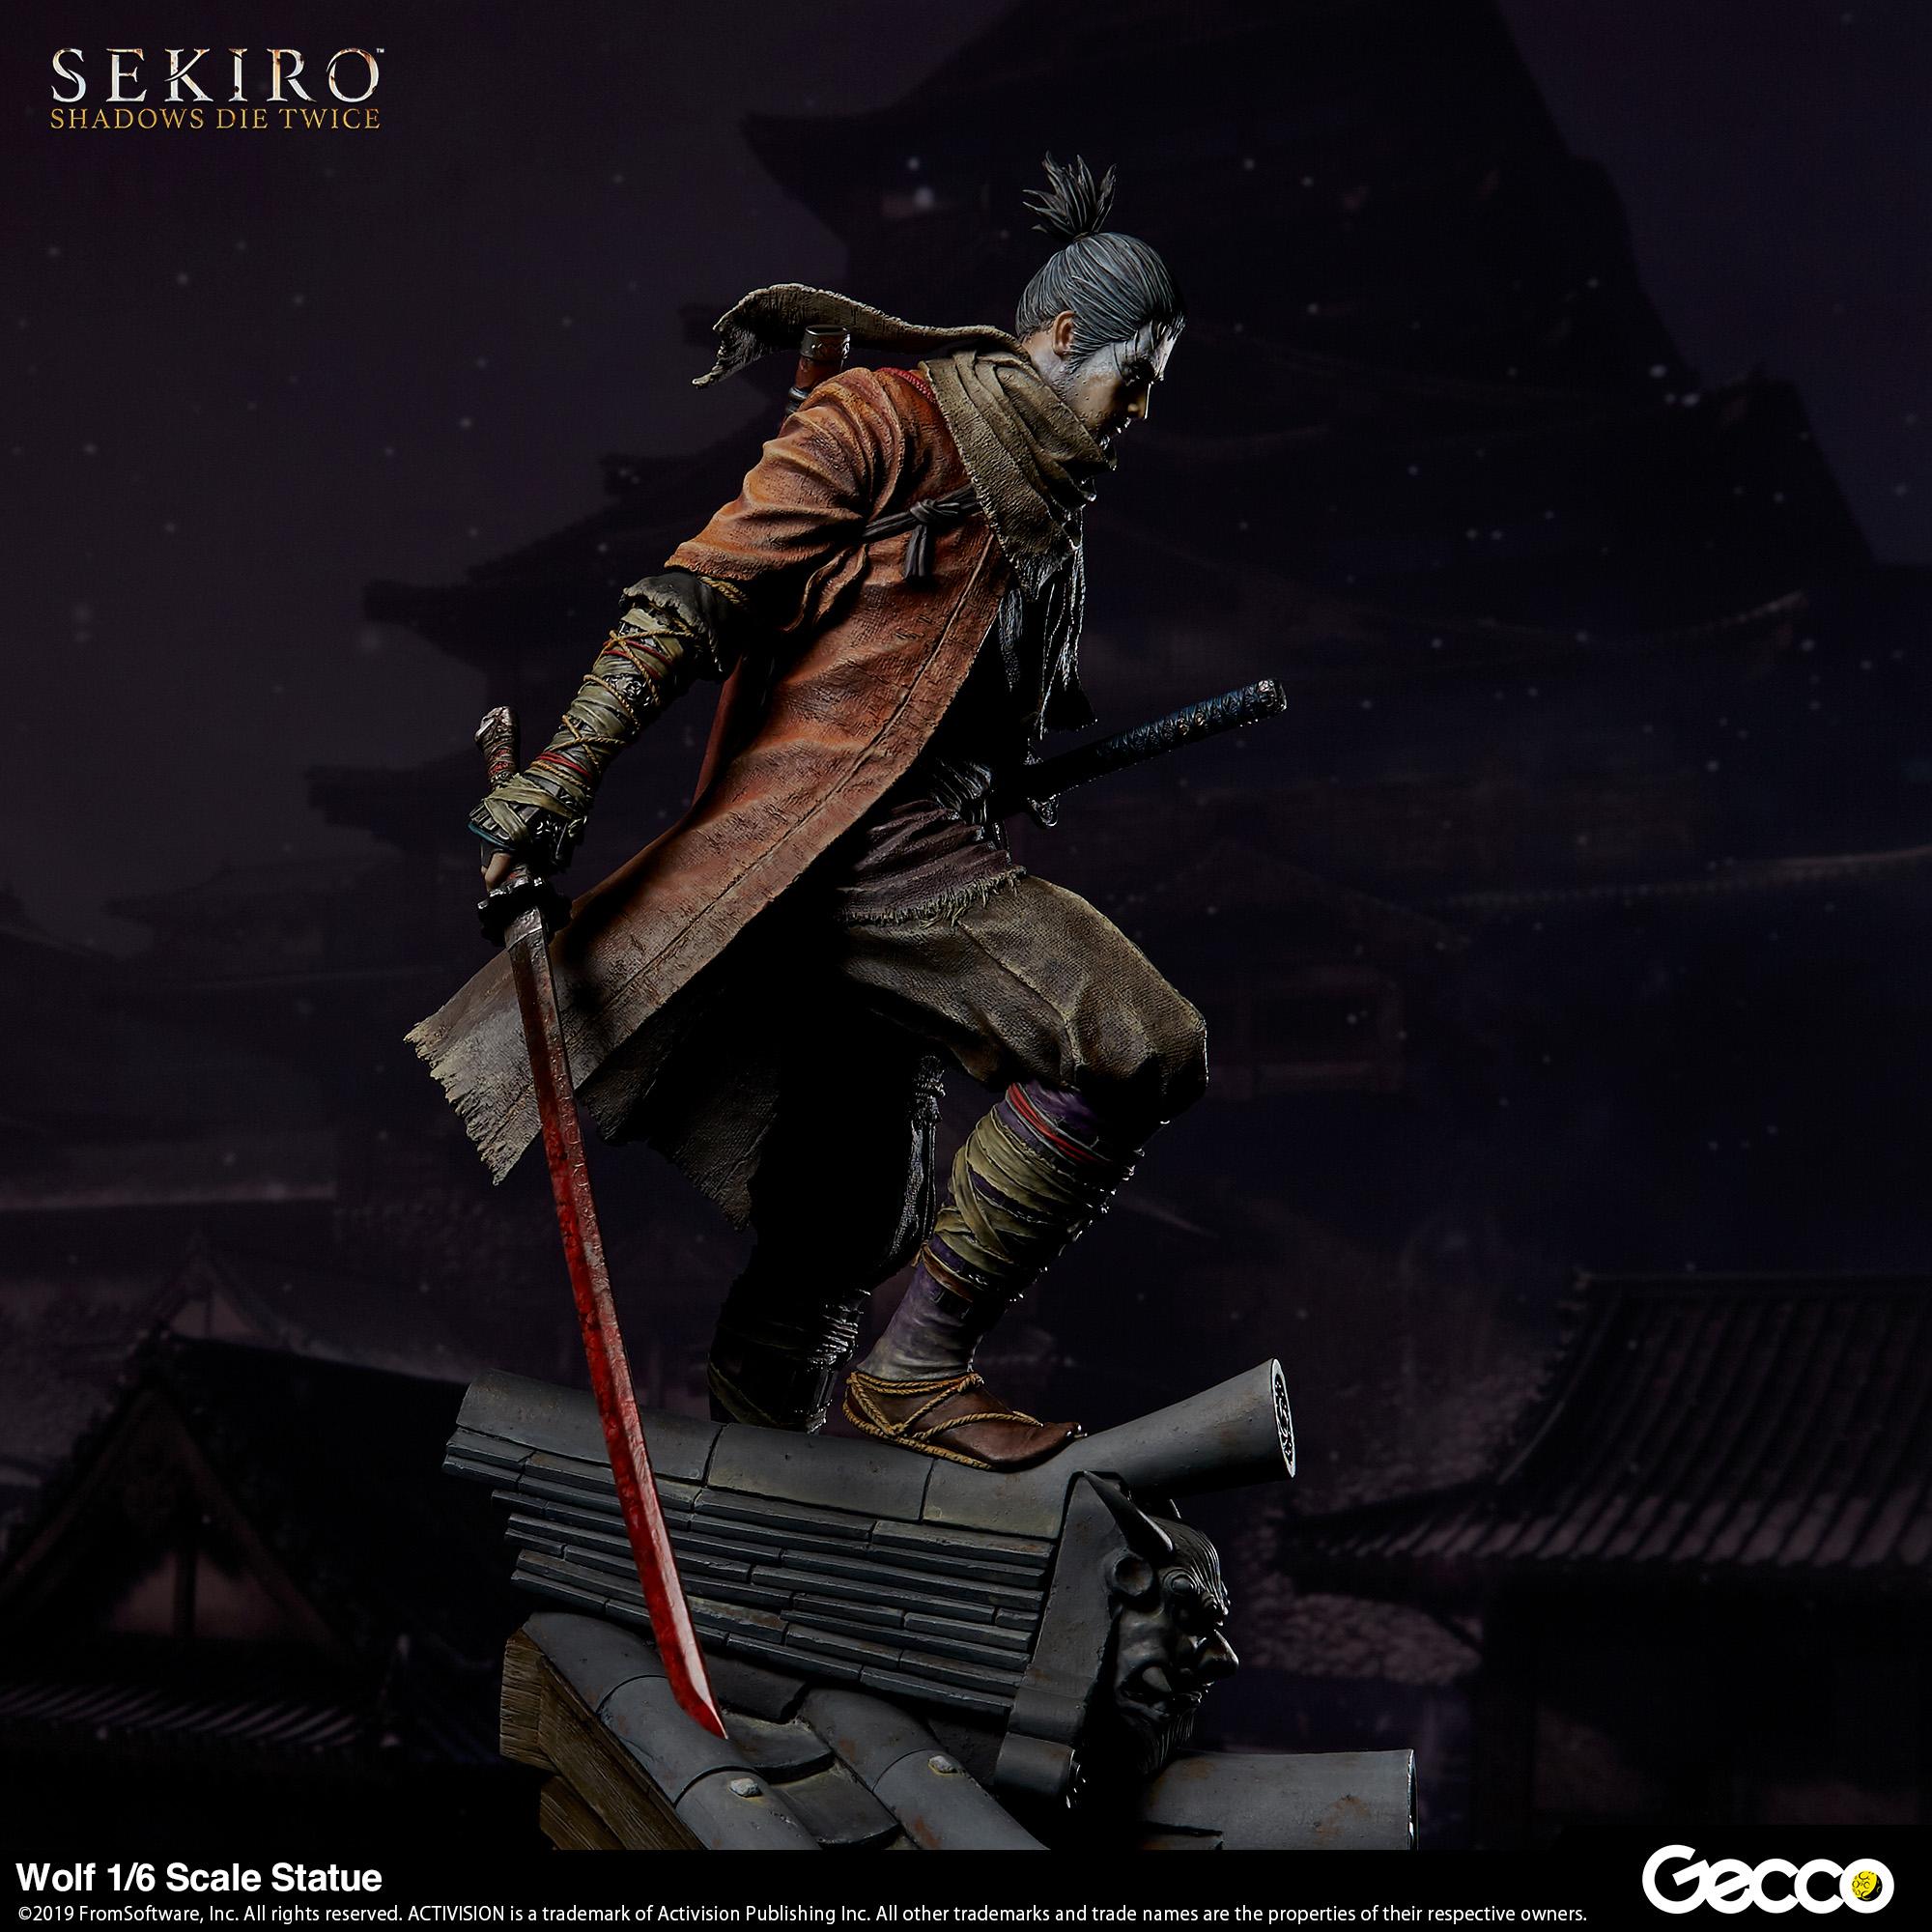 Link a Sekiro_Shadows_die_Twice_Wolf_Okami_Lupo_Statue_Figure_Gecco-1 (2)